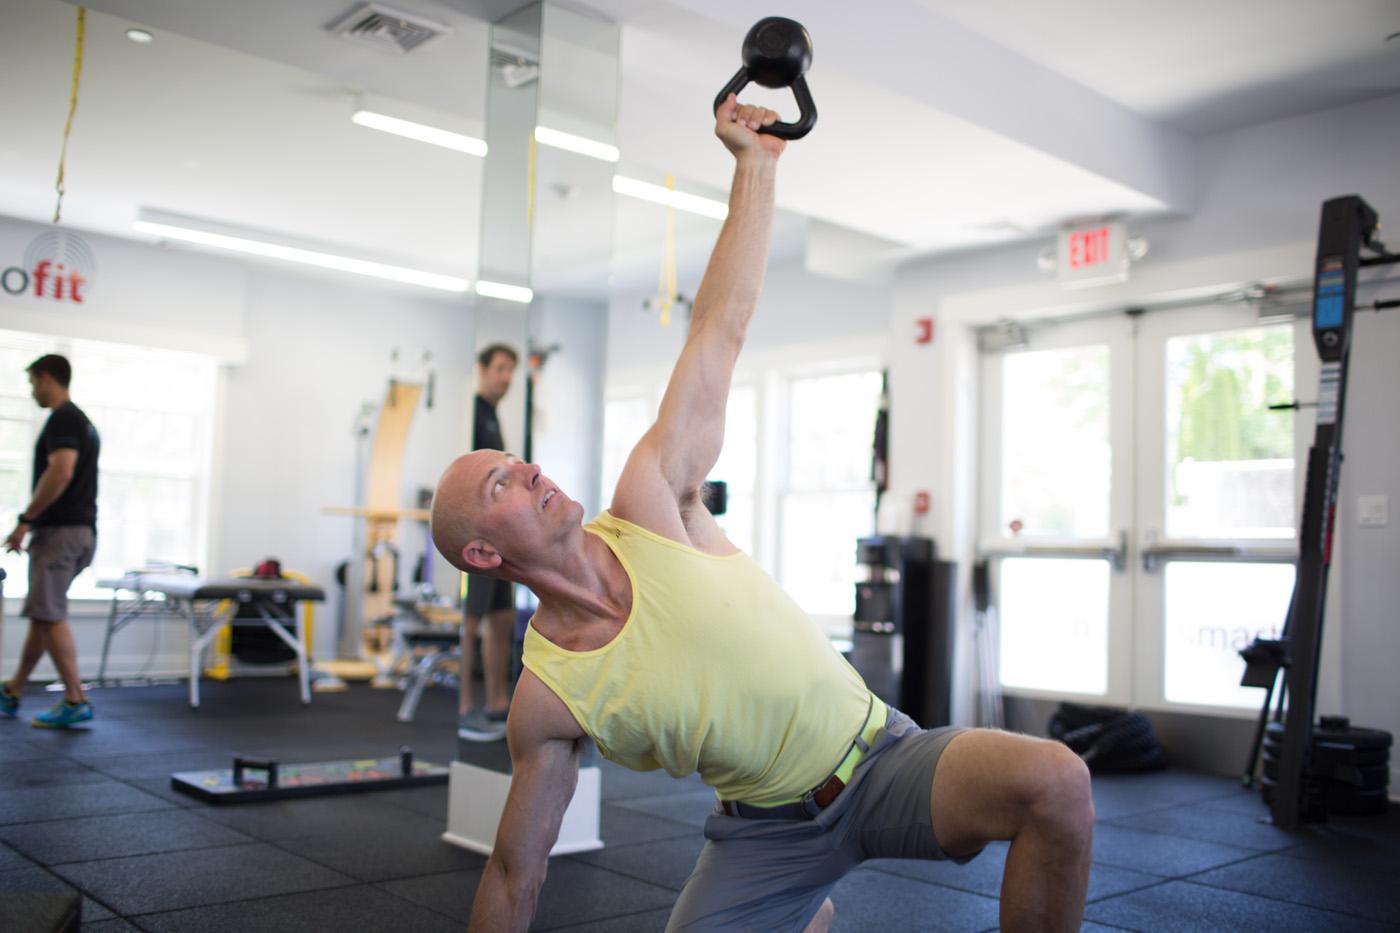 Philosofit_East_Hamptons_Fitness_Personal_Training_0032.jpg